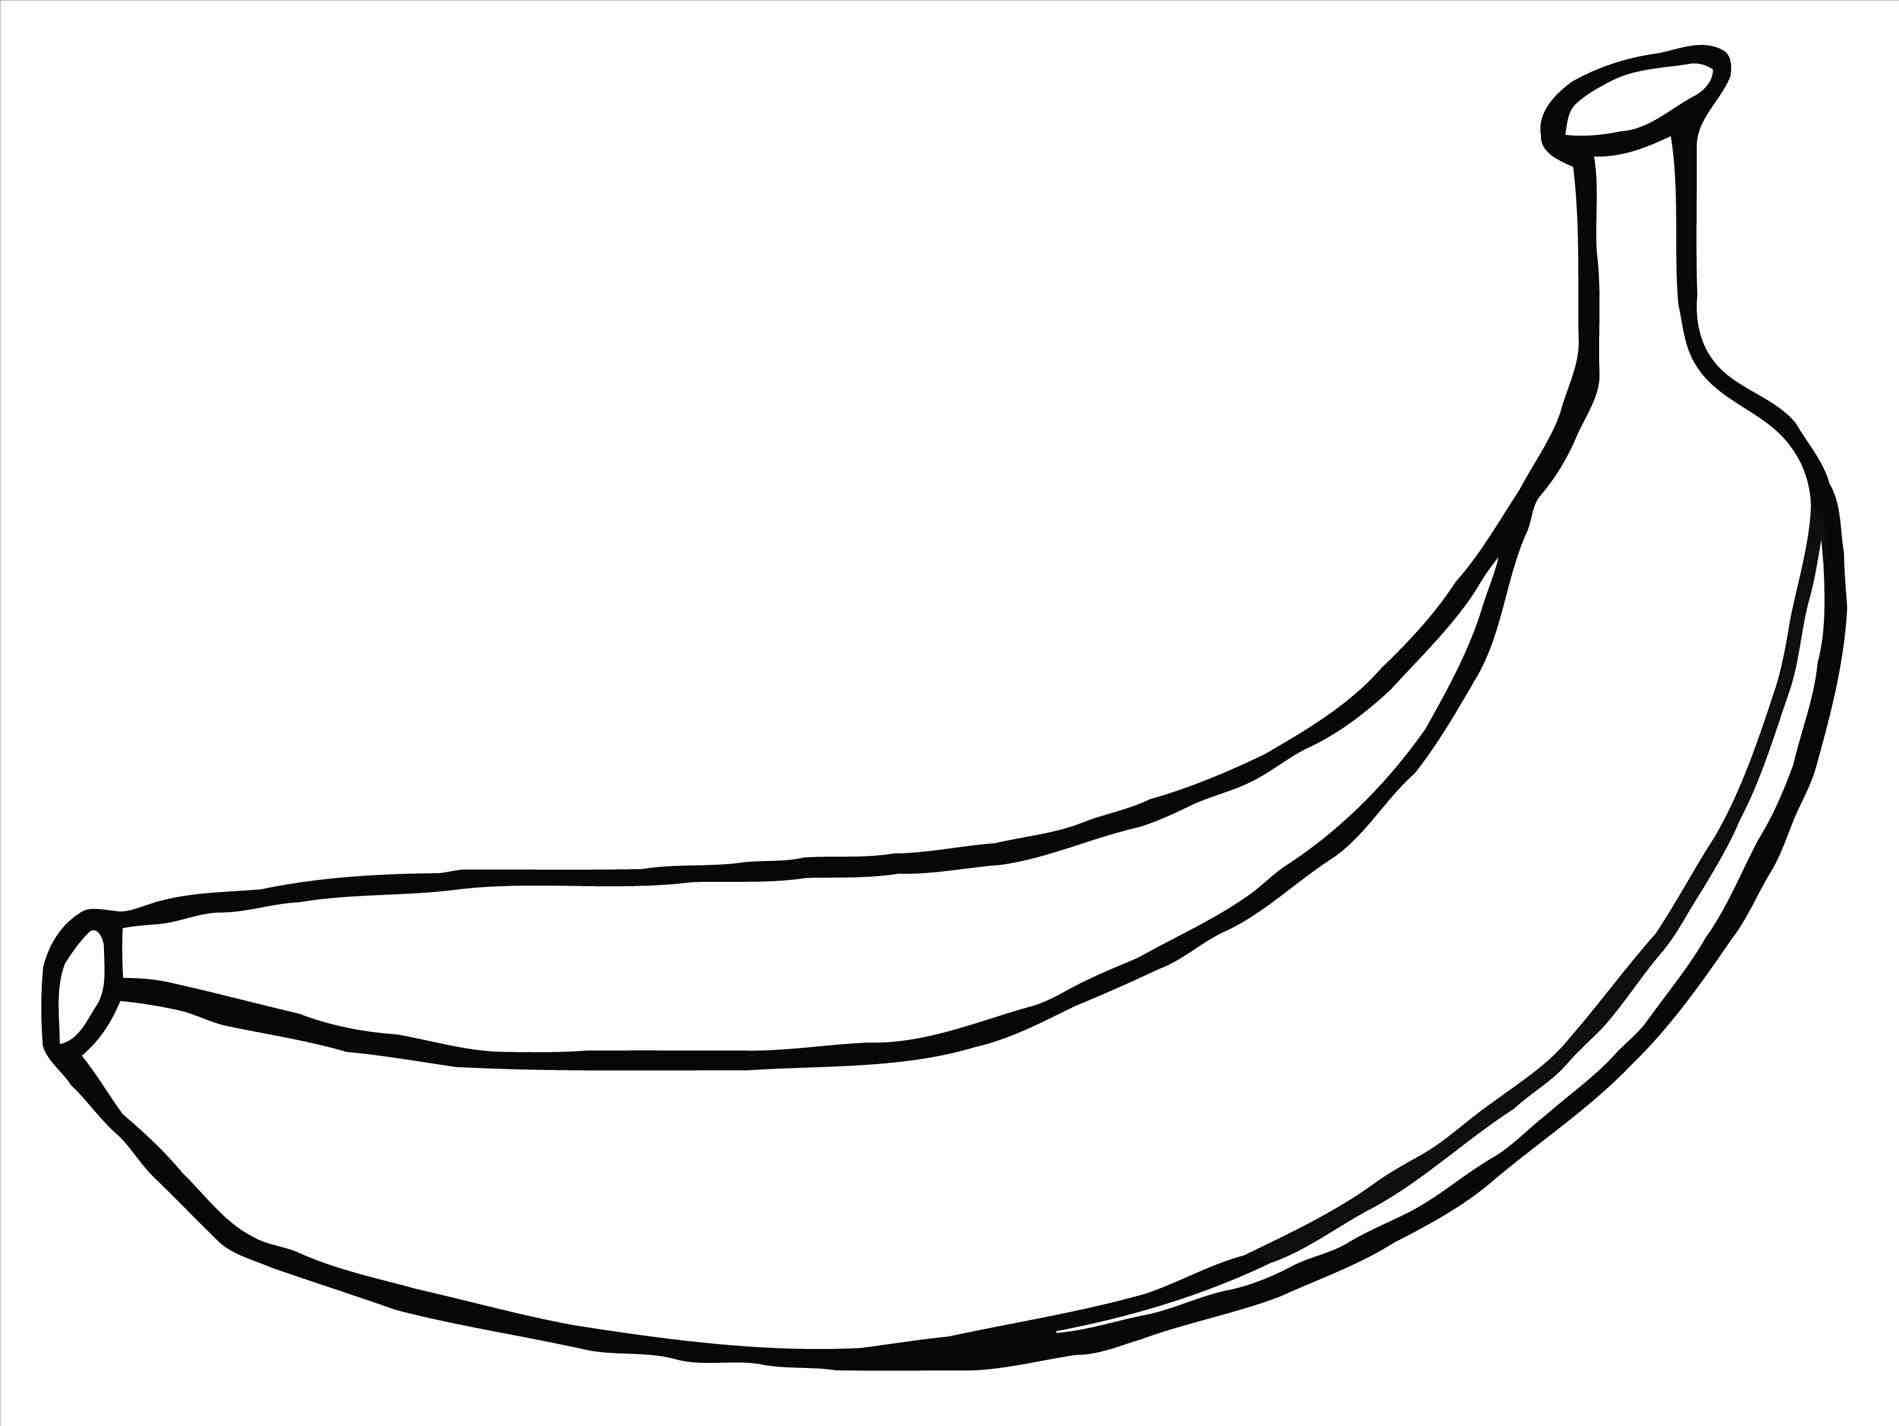 Banana Design Juicy Fresh Fruit Icon Vector Template. Raw Banana